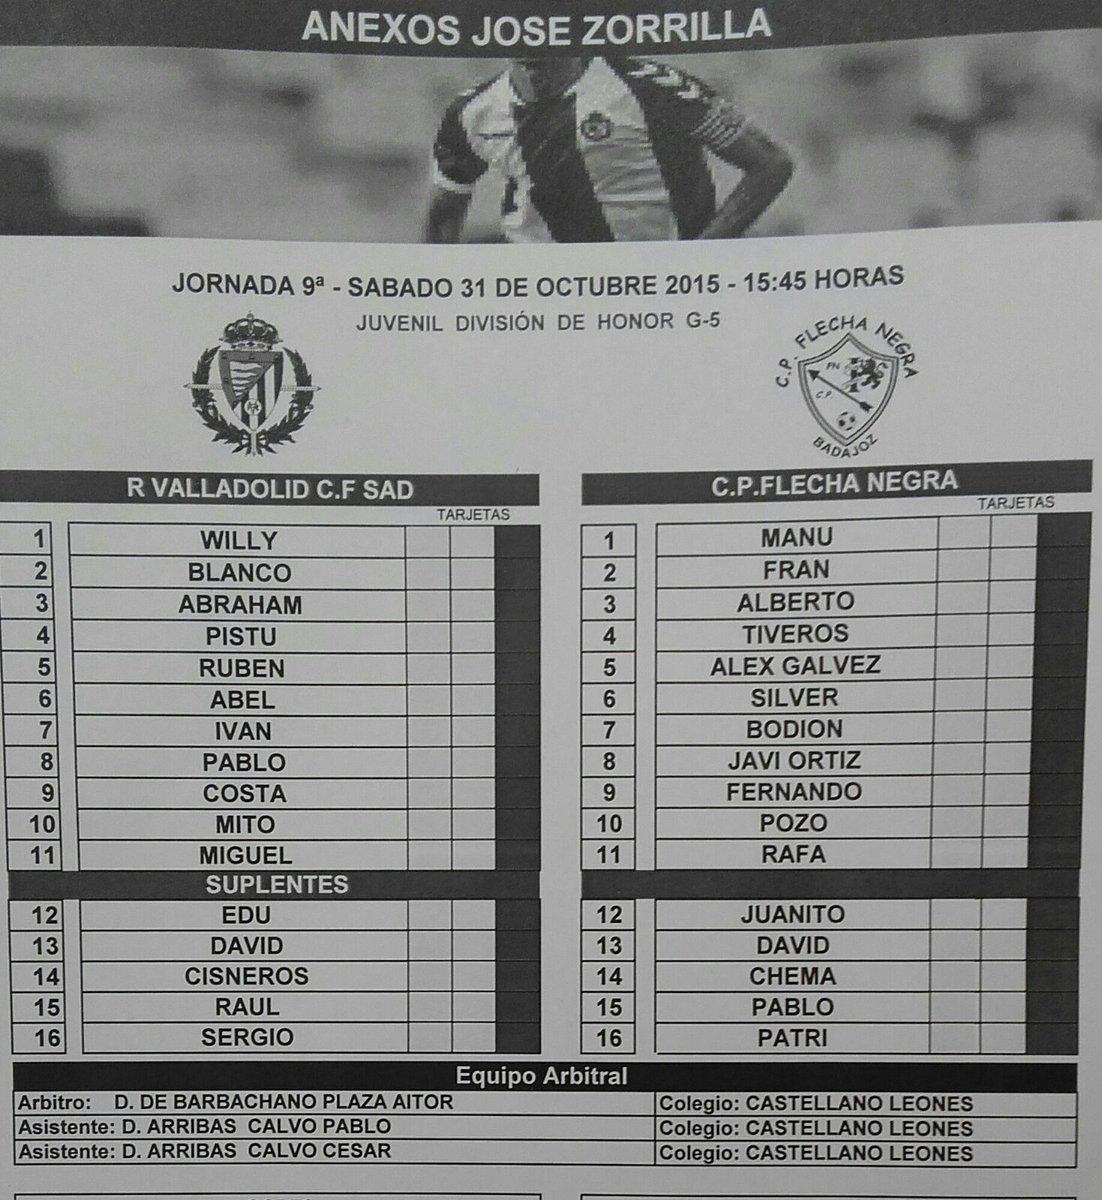 Real Valladolid Juvenil A - Temporada 2015/16 - División de Honor Grupo V - Página 6 CSp0pDeWsAErJ49